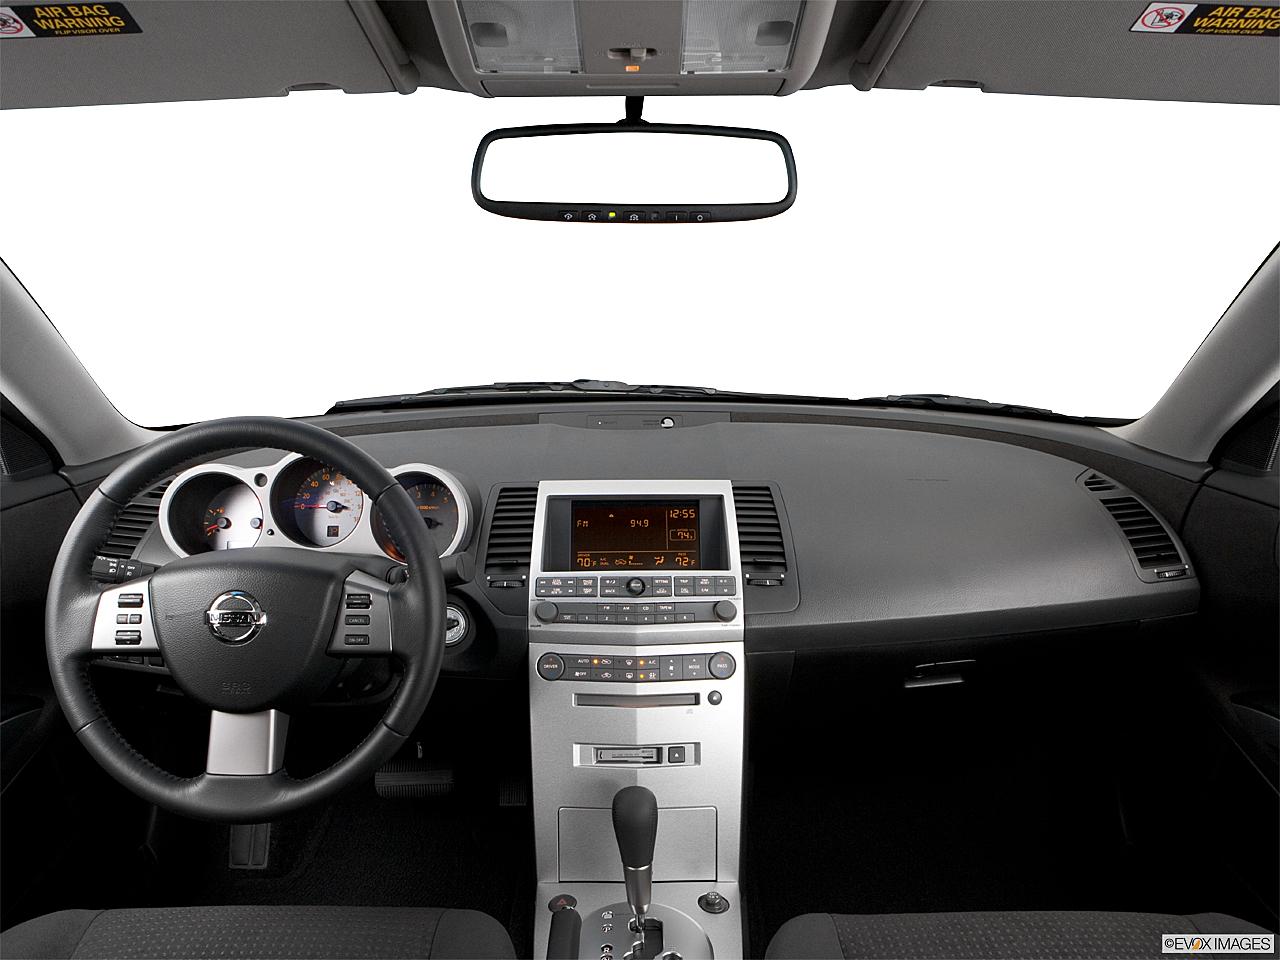 2006 Nissan Maxima 3.5 SE, centered wide dash shot